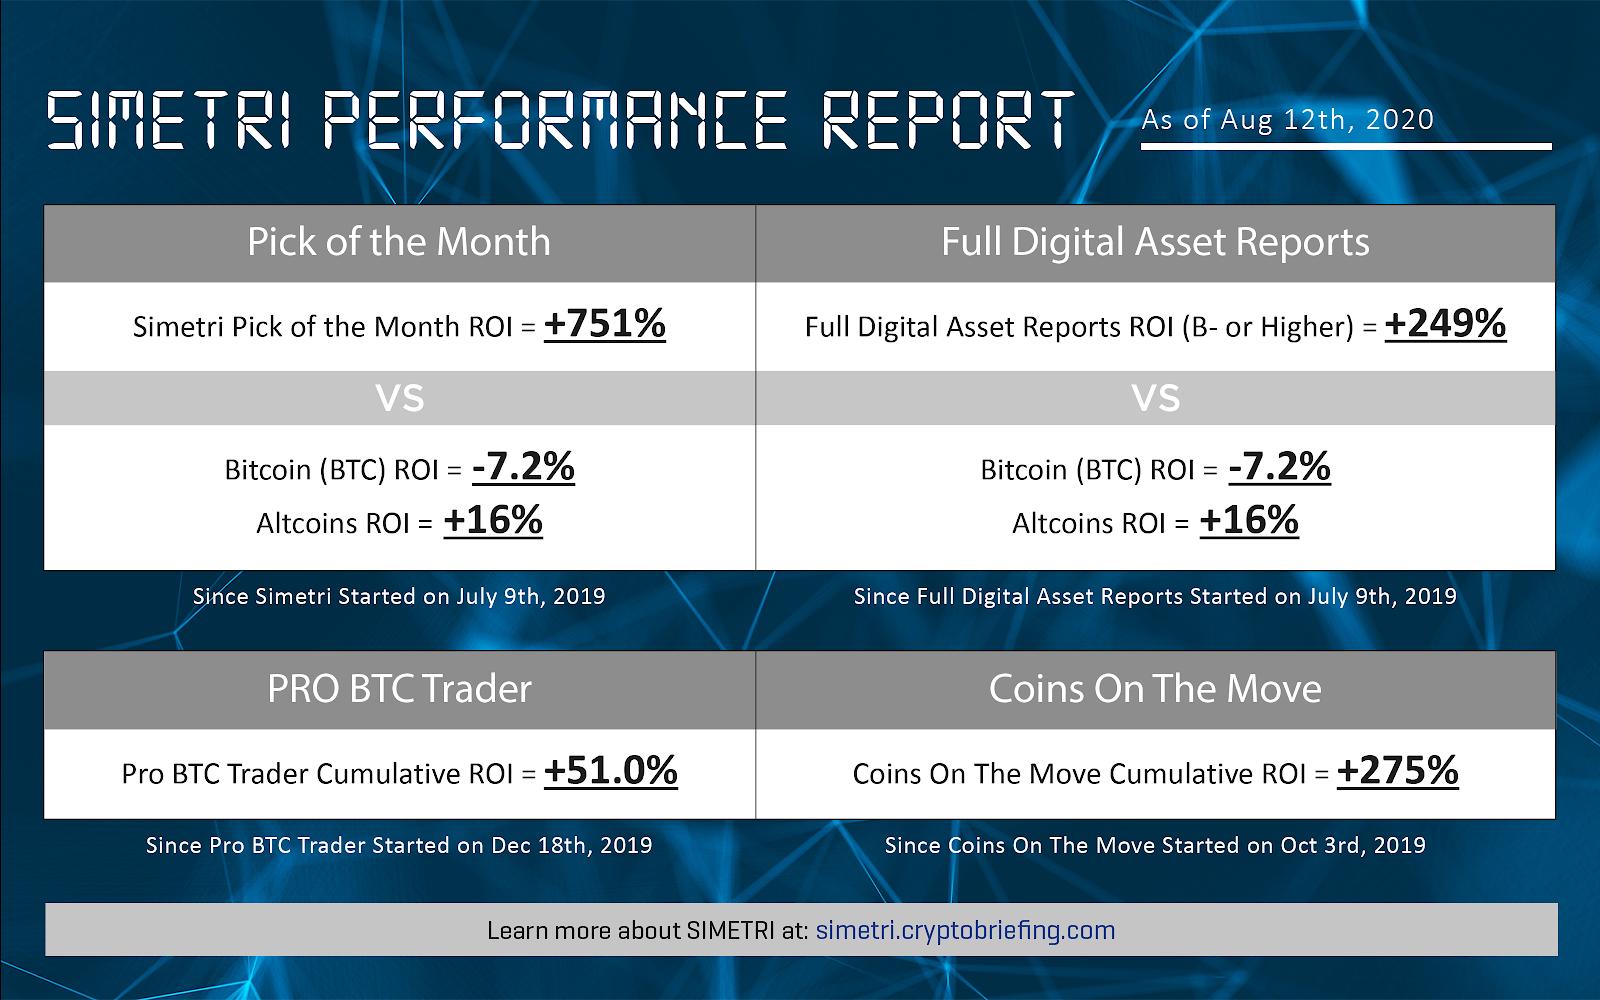 SIMETRI performance report scorecard